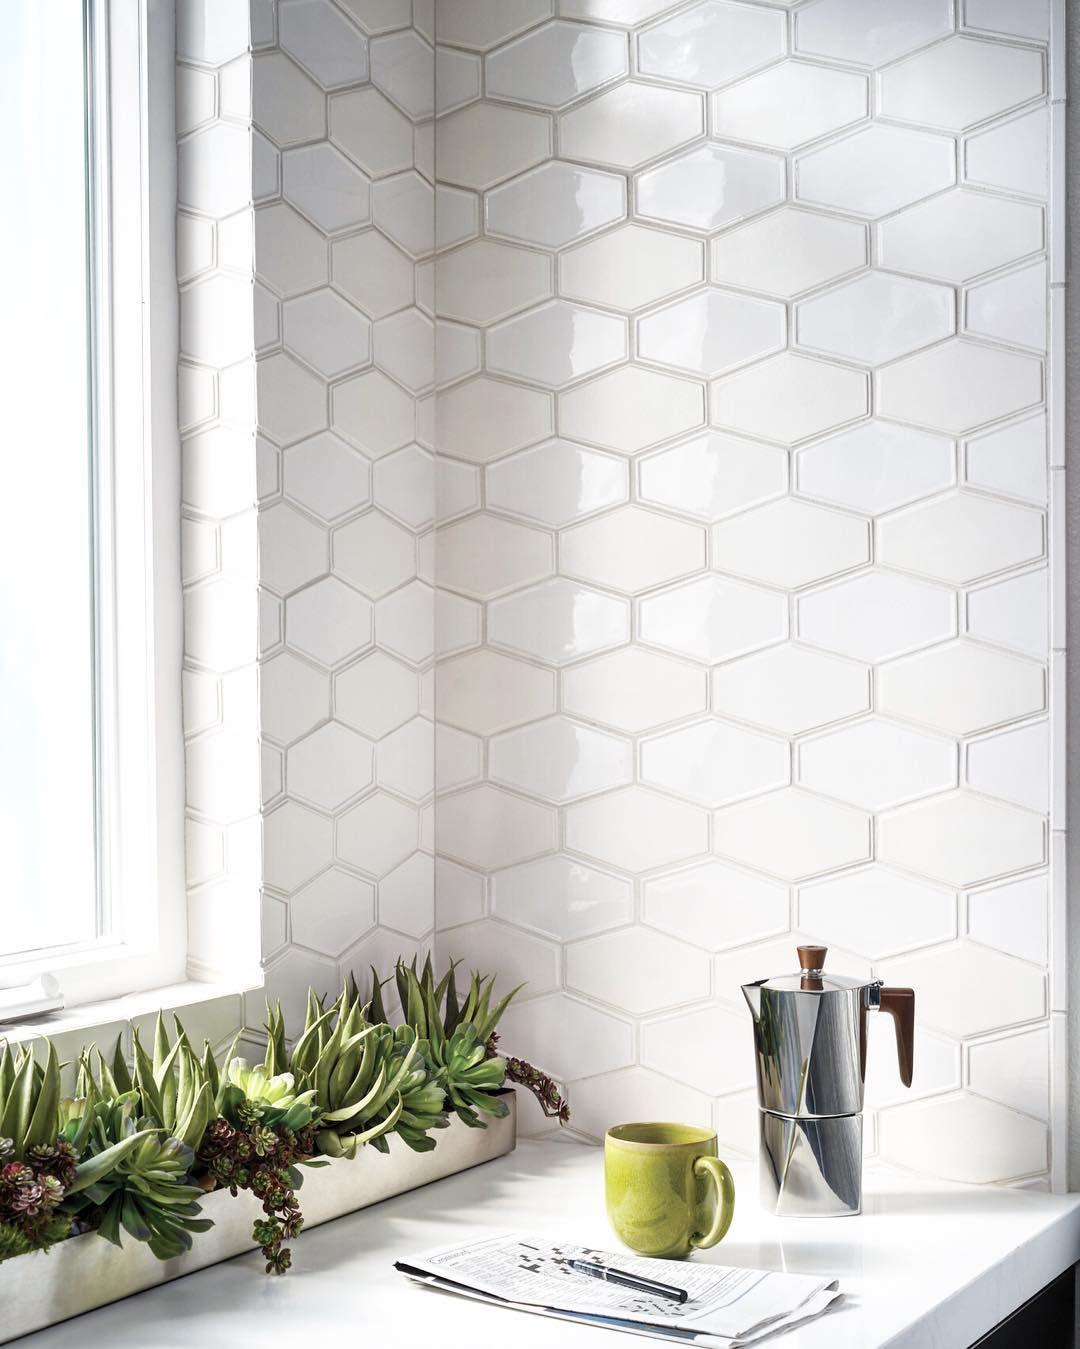 Ceramic Tile Kitchen Backsplash: Crossword Clue: 7 Letters. A Six-sided Shape That Makes A